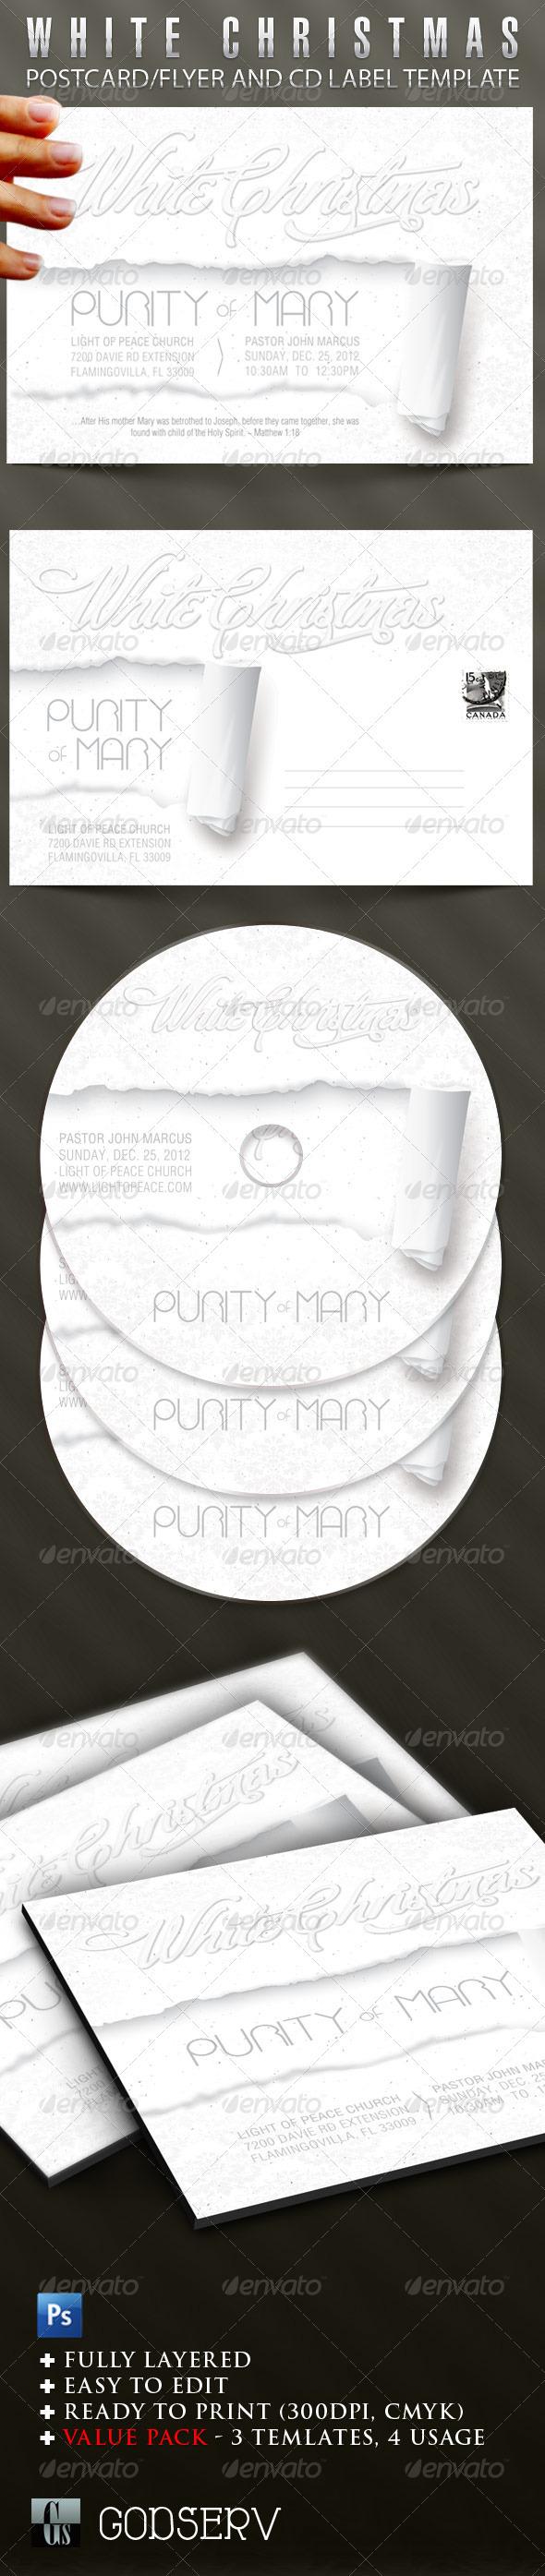 White Christmas Flyer CD Template - Church Flyers